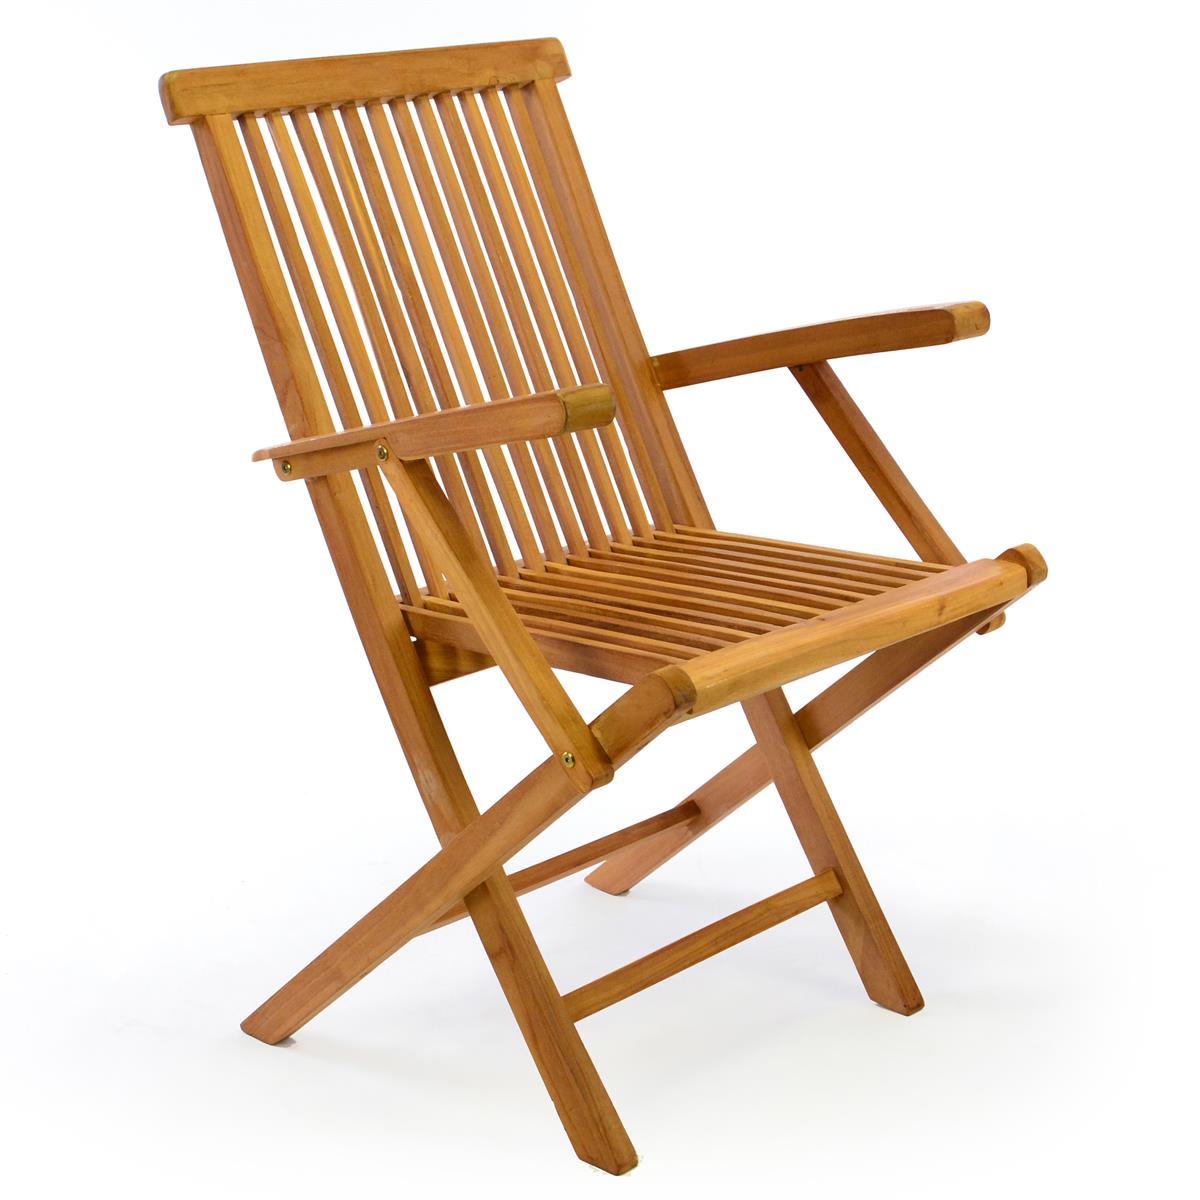 DIVERO Gartenstuhl mit Armlehne Stuhl Teak Holz klappbar massiv behandelt